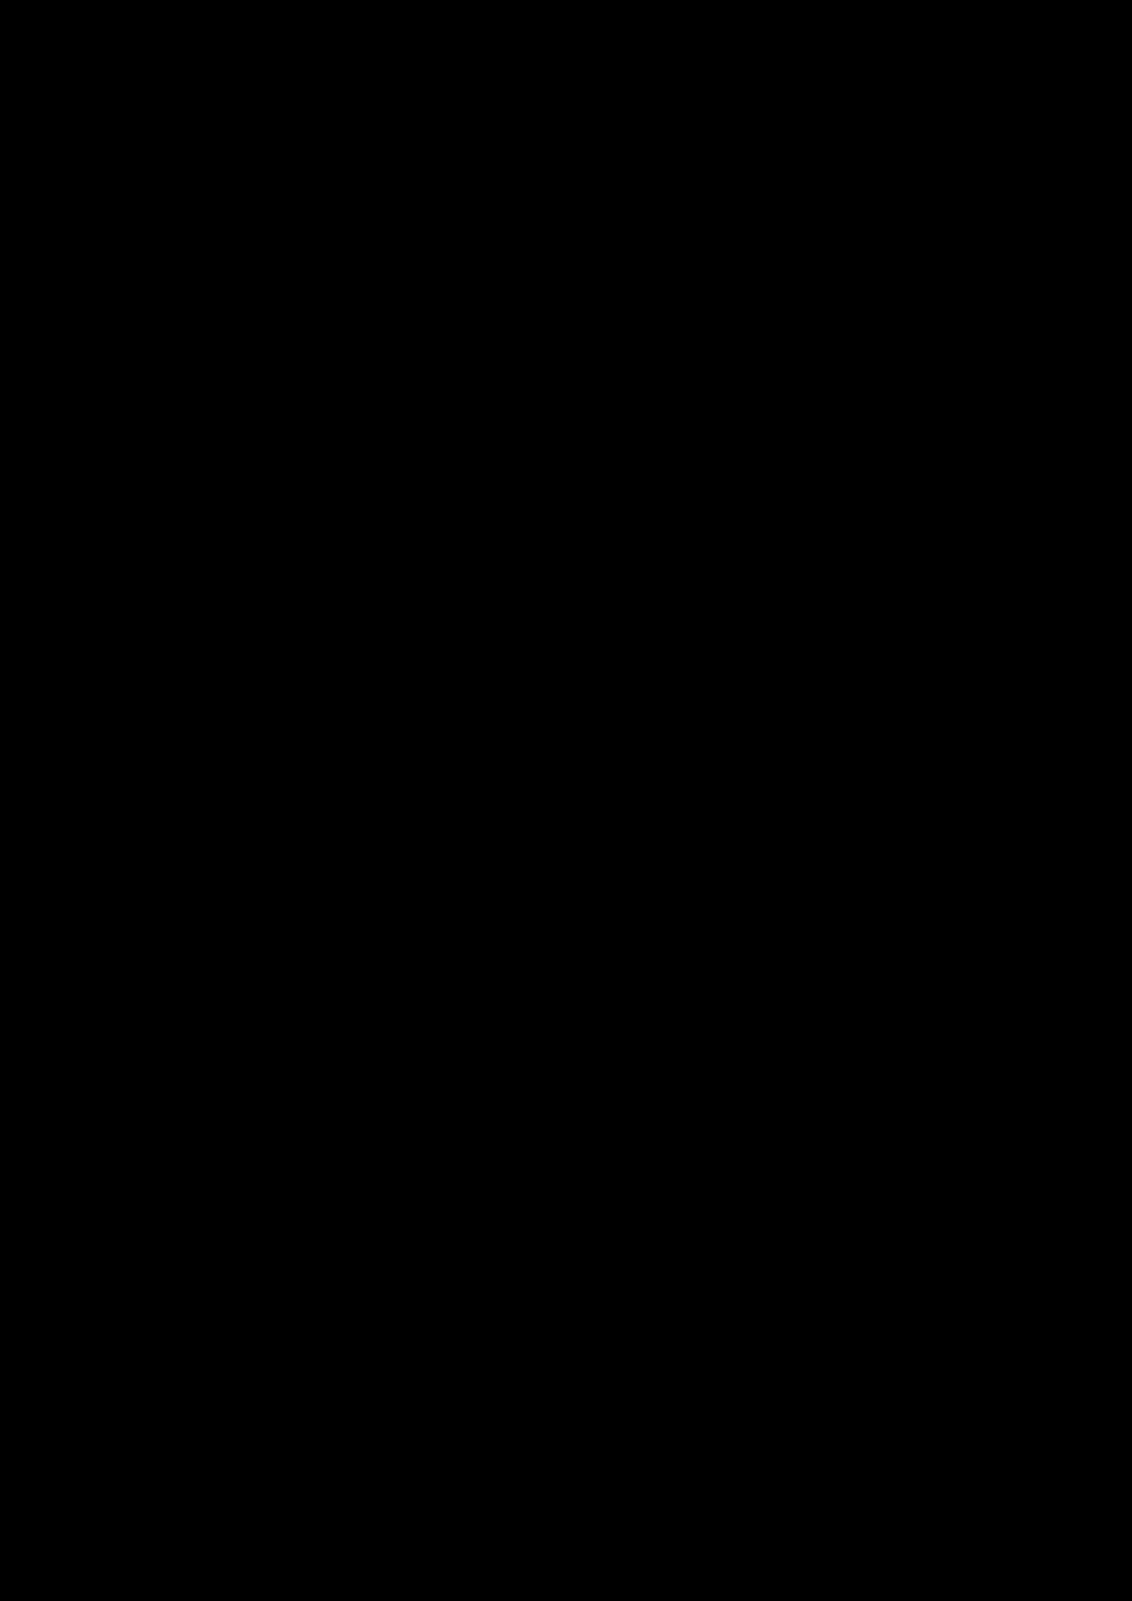 18 berez slide, Image 21